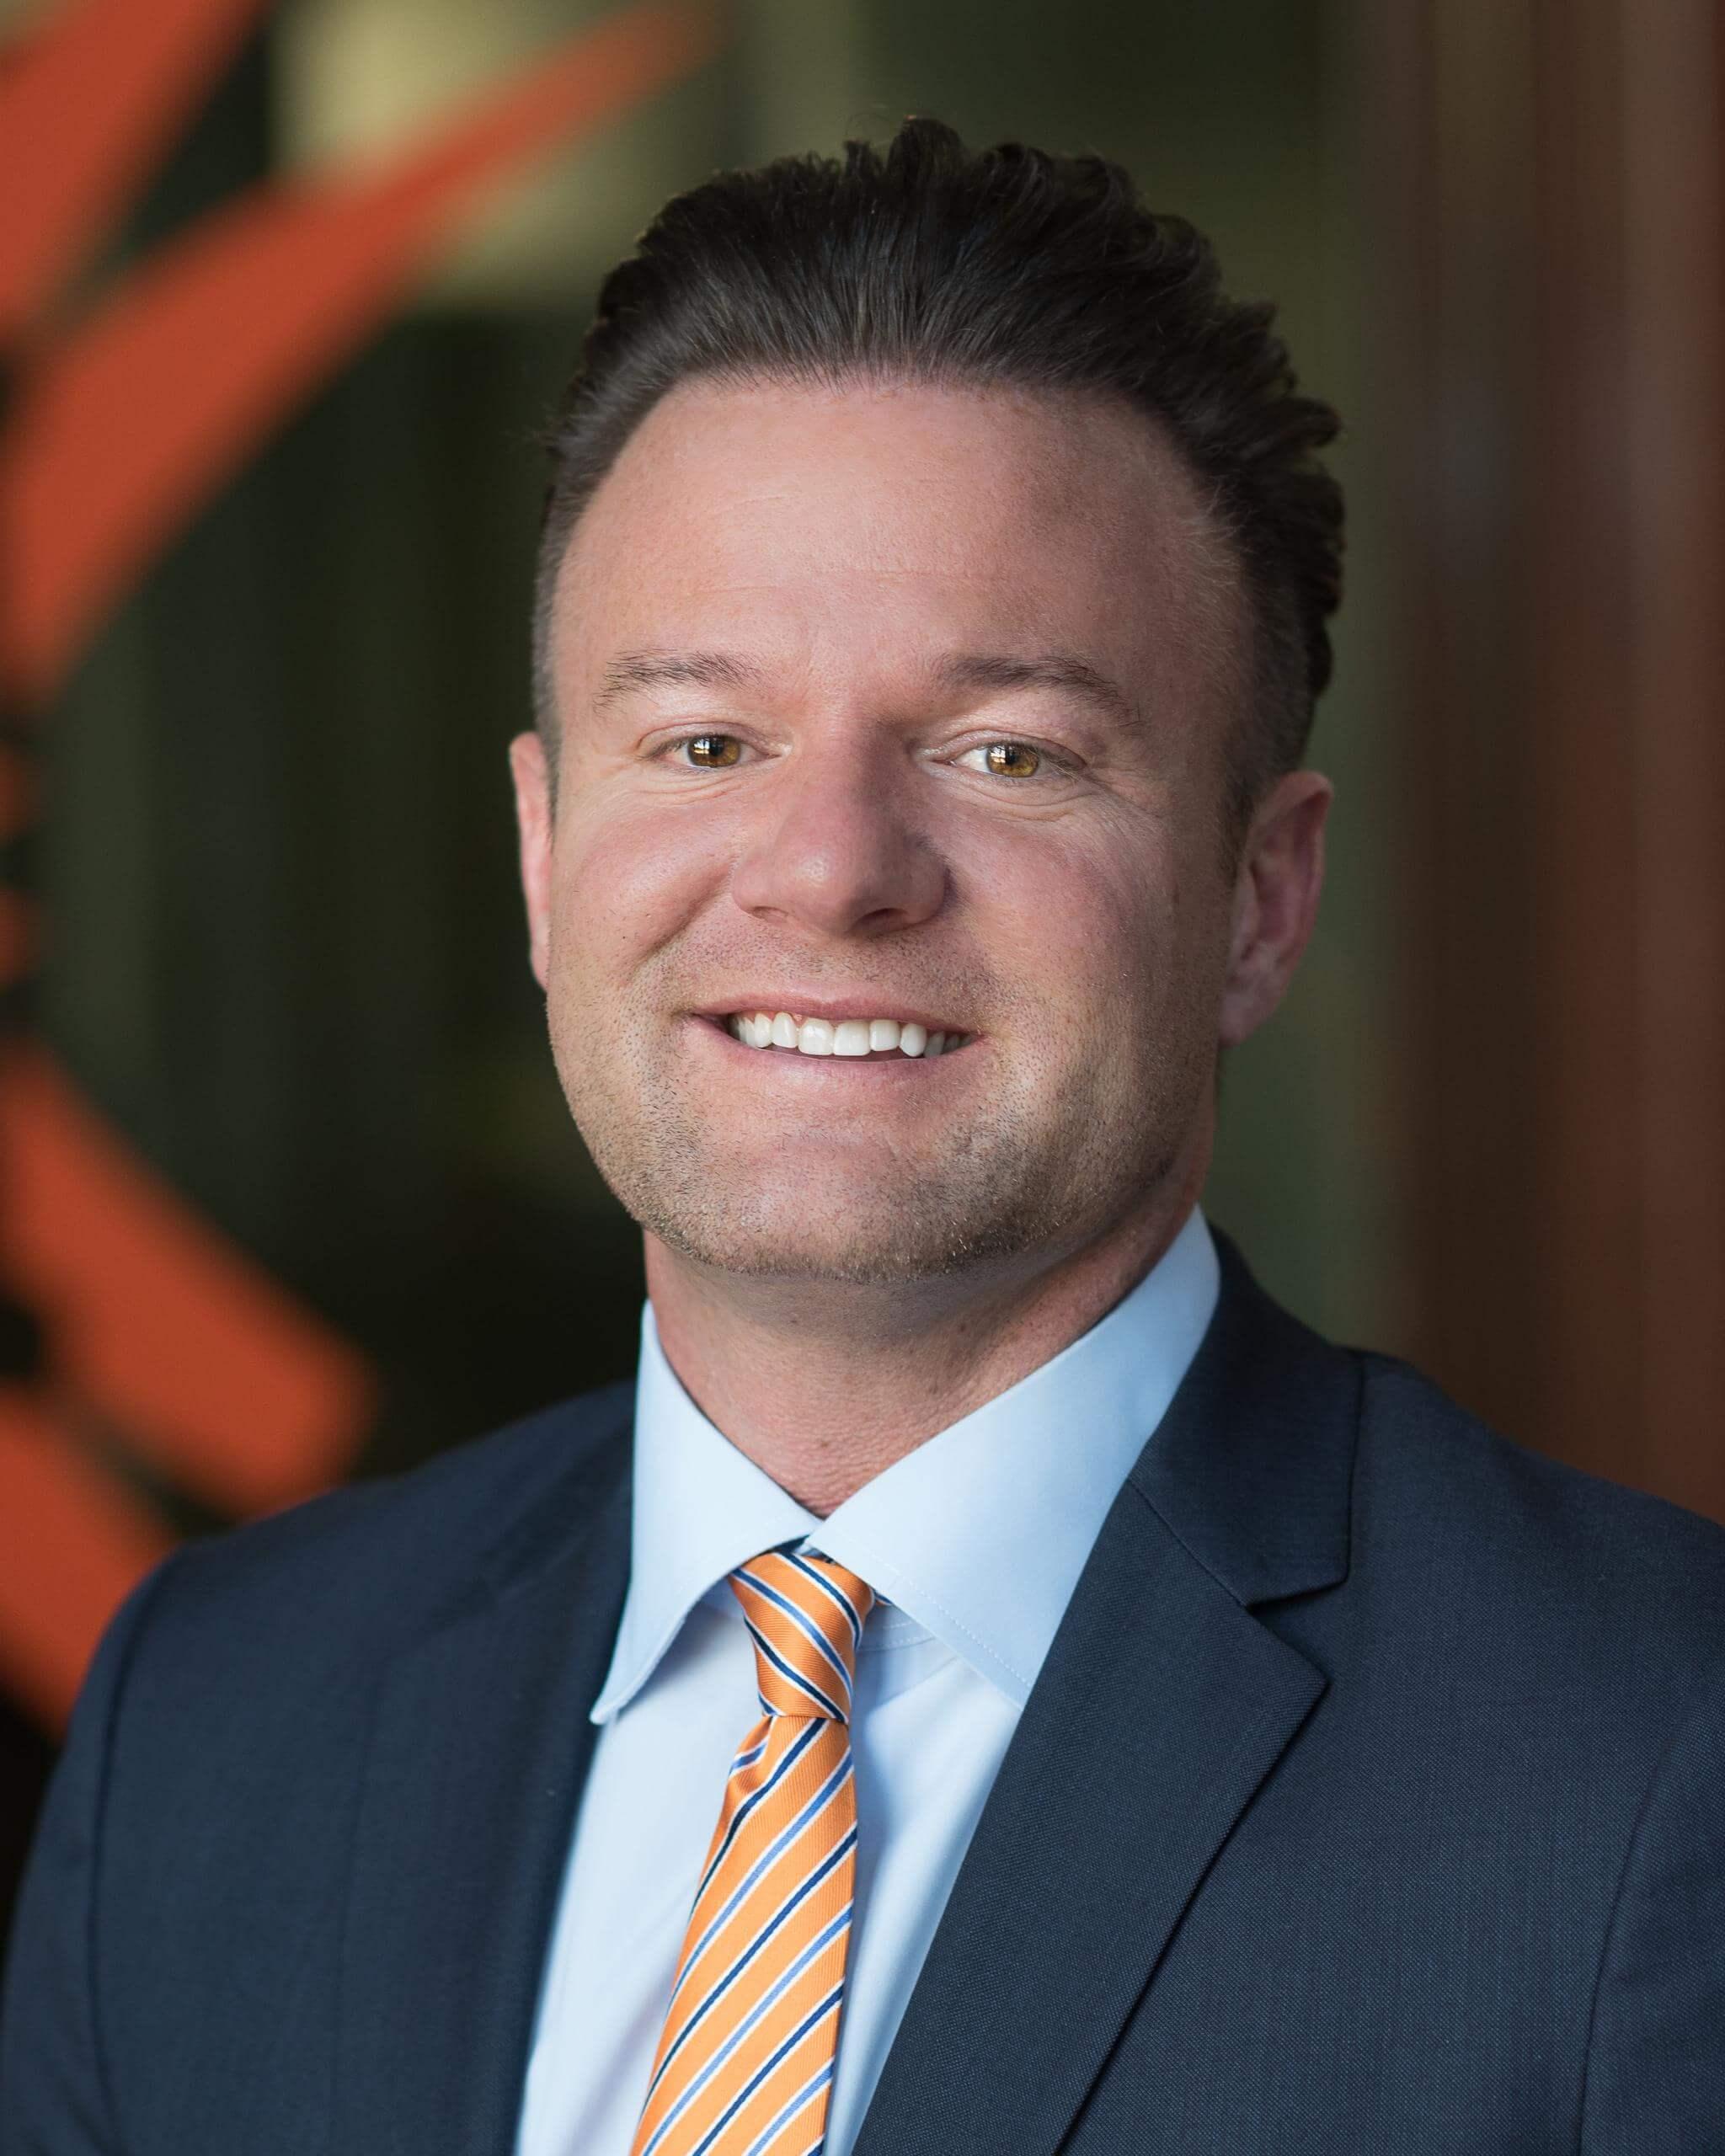 SkyView Partners CEO Scott Wetzel